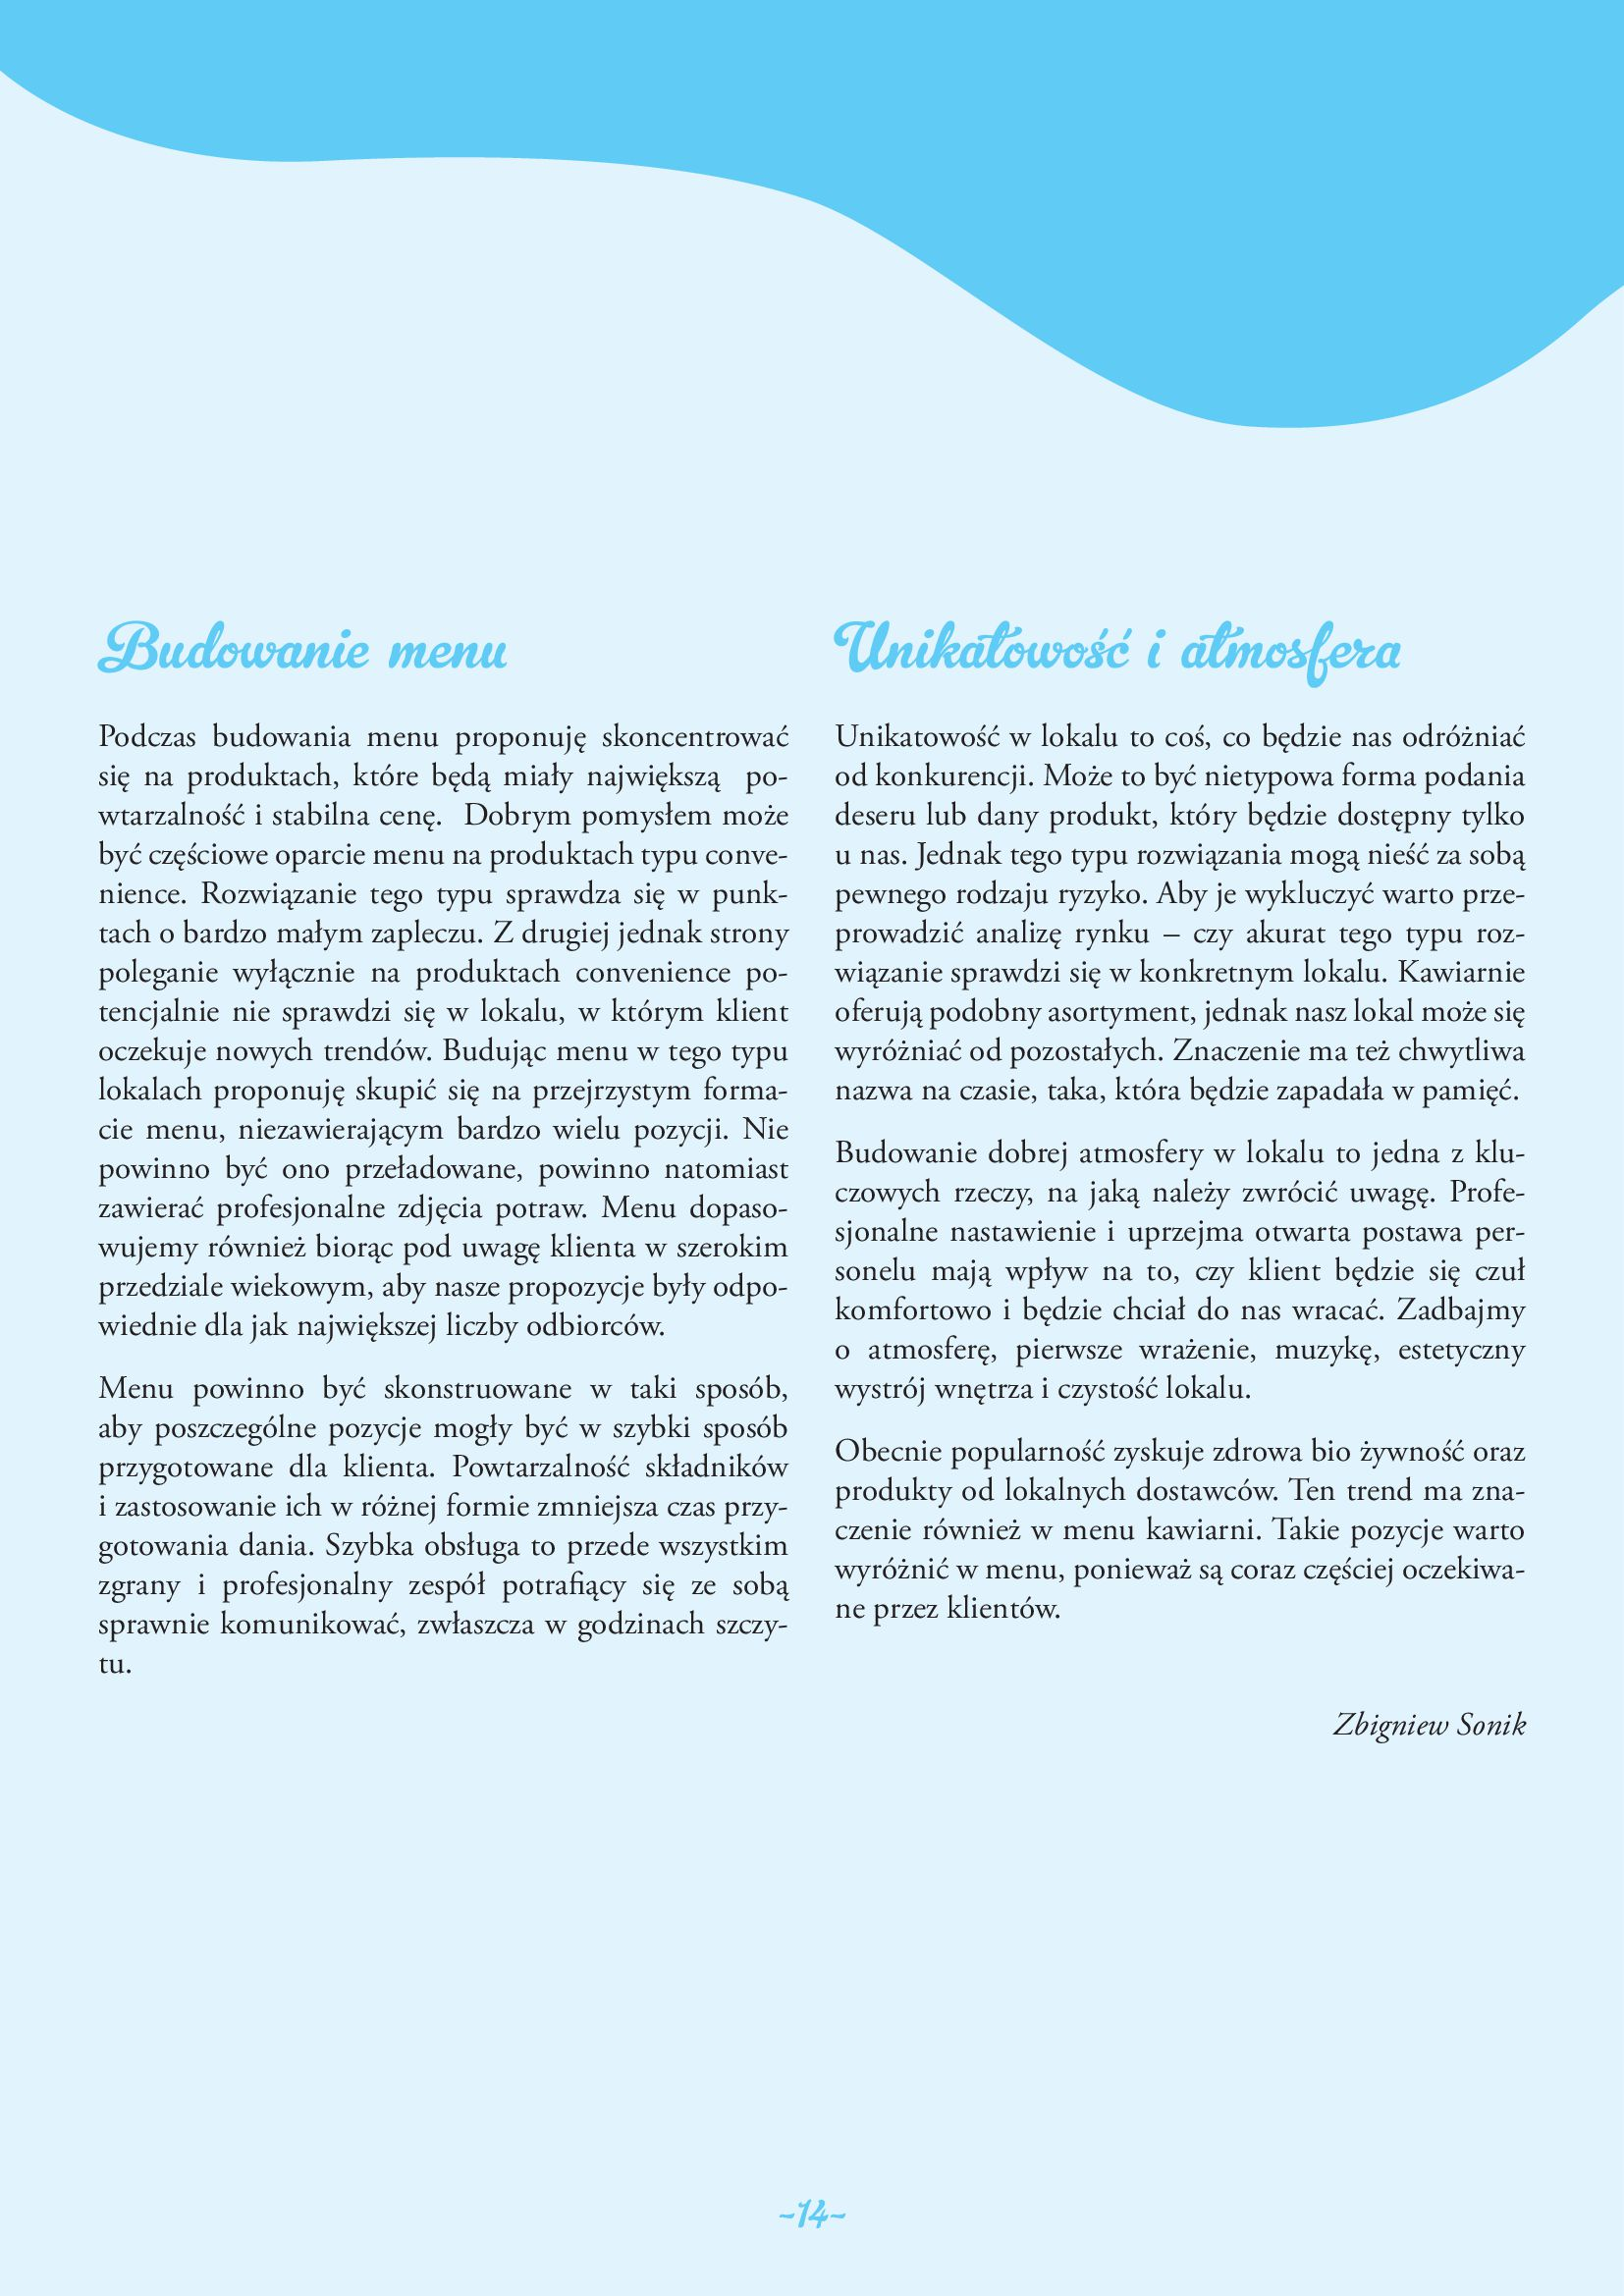 Gazetka Makro: Gazetka Makro - lody i desery 2021-05-21 page-14